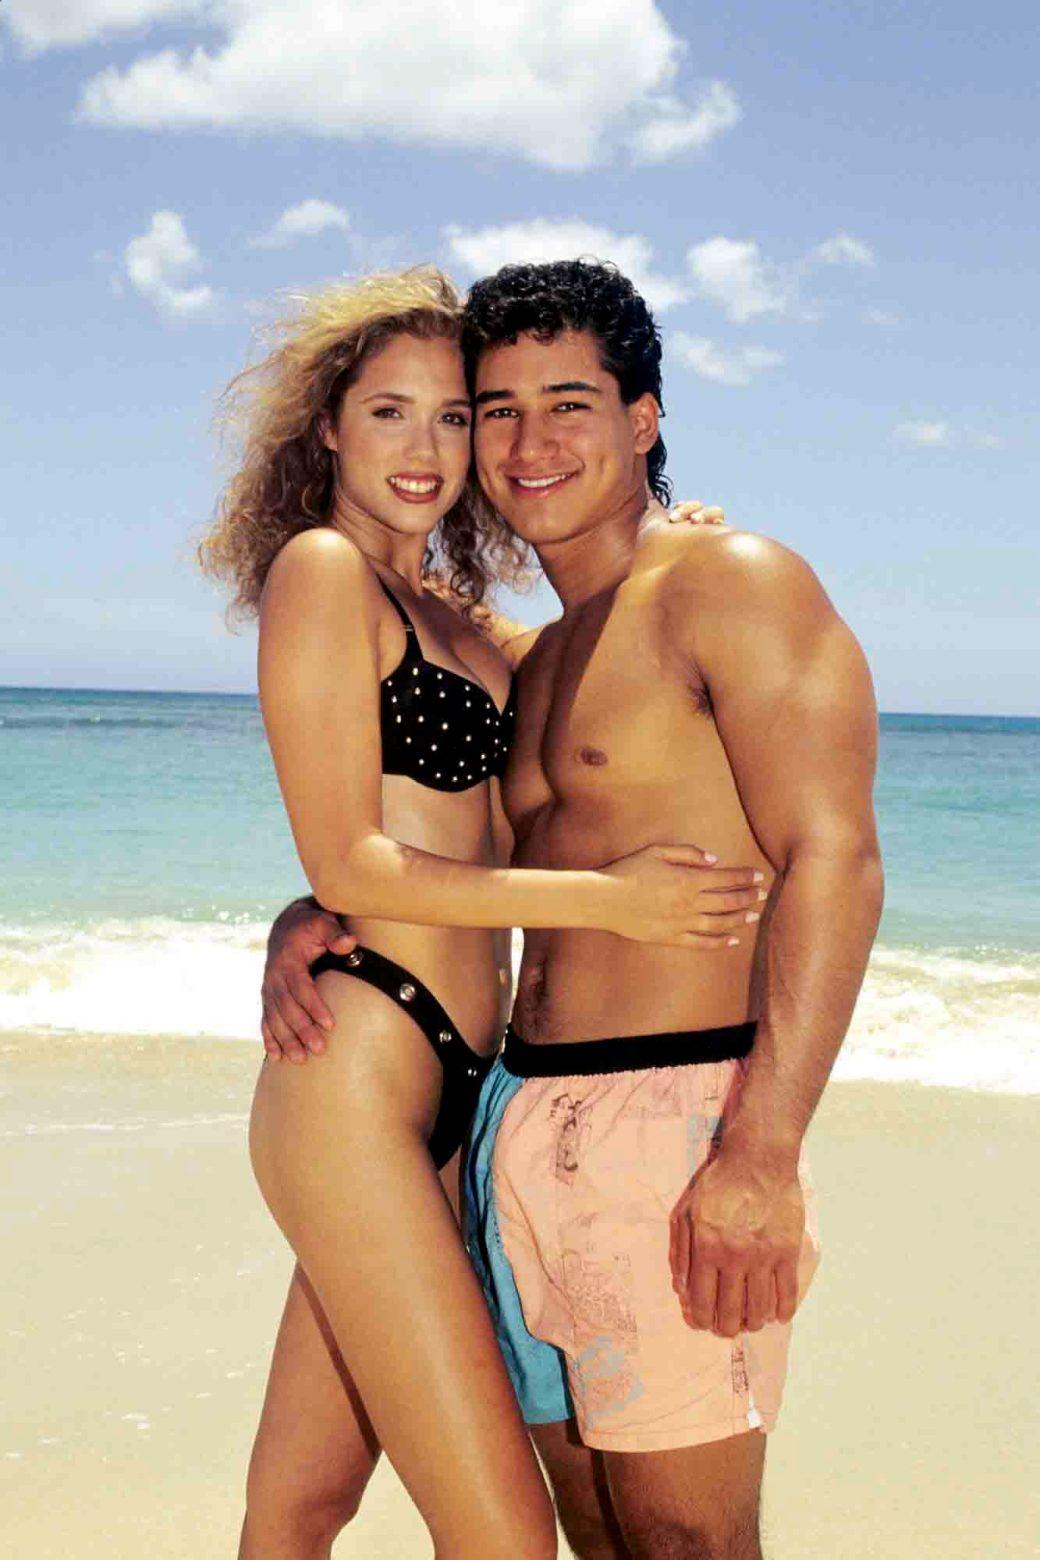 SAVED BY THE BELL: HAWAIIAN STYLE, Elizabeth Berkley, Mario Lopez, 1992, (c)NBC/courtesy Everett Col